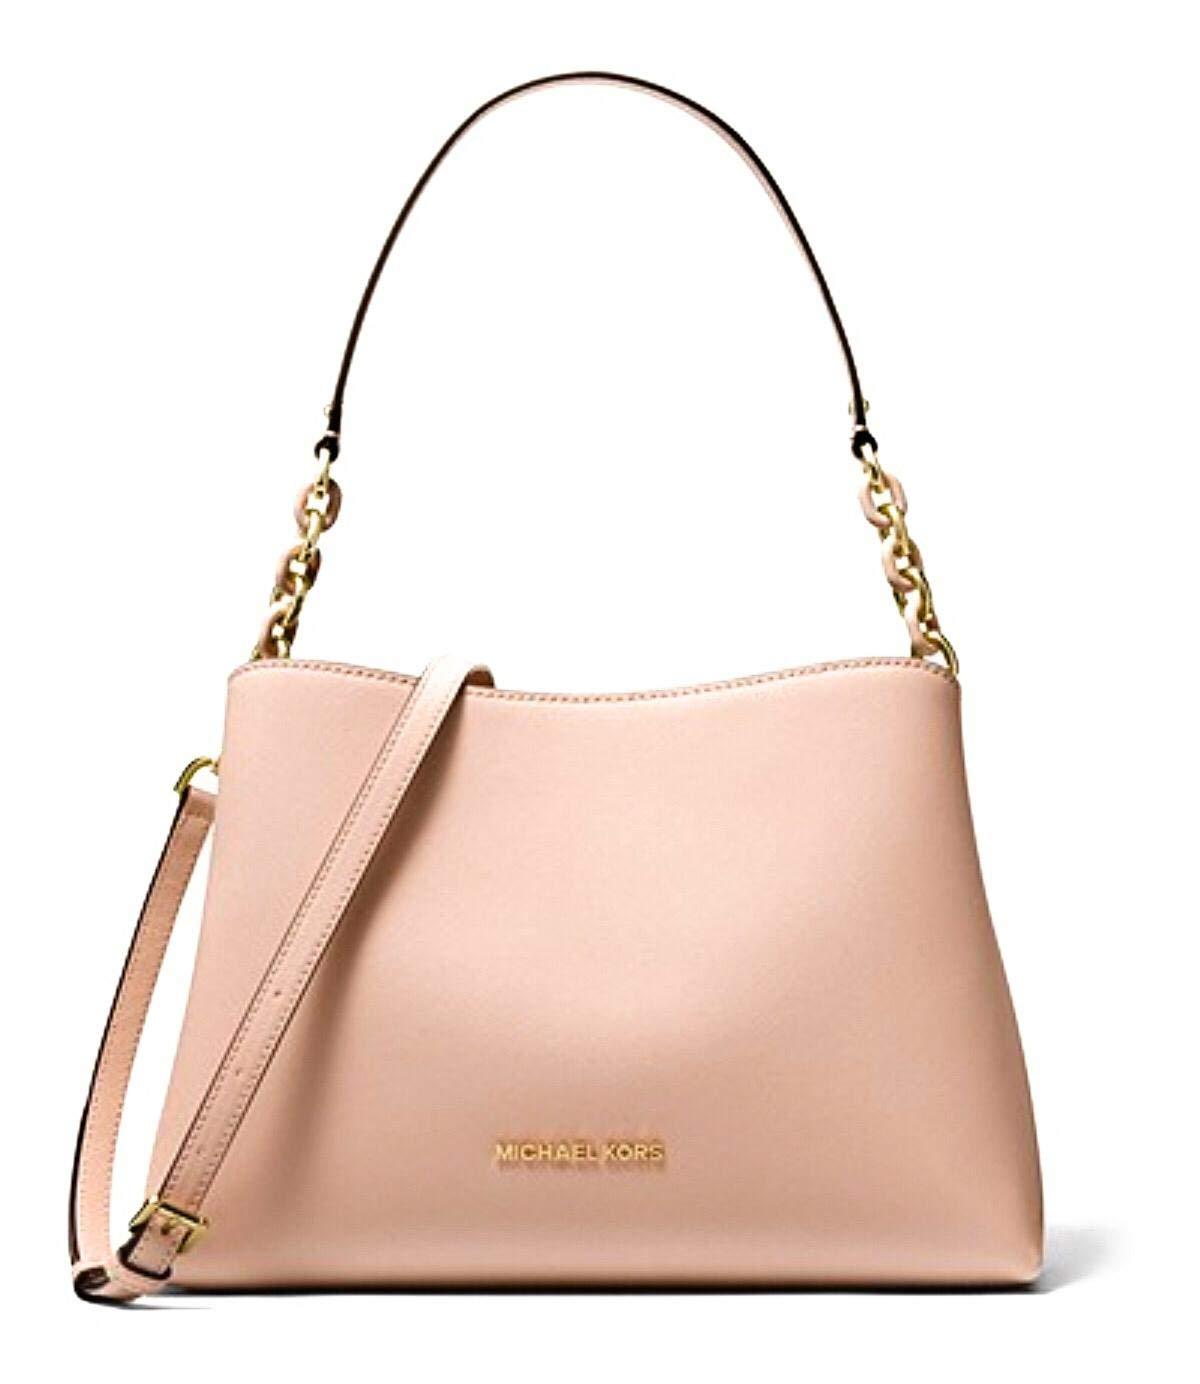 Michael Kors Sofia Large Leather EW Satchel Shoulder Bag (Ballet)